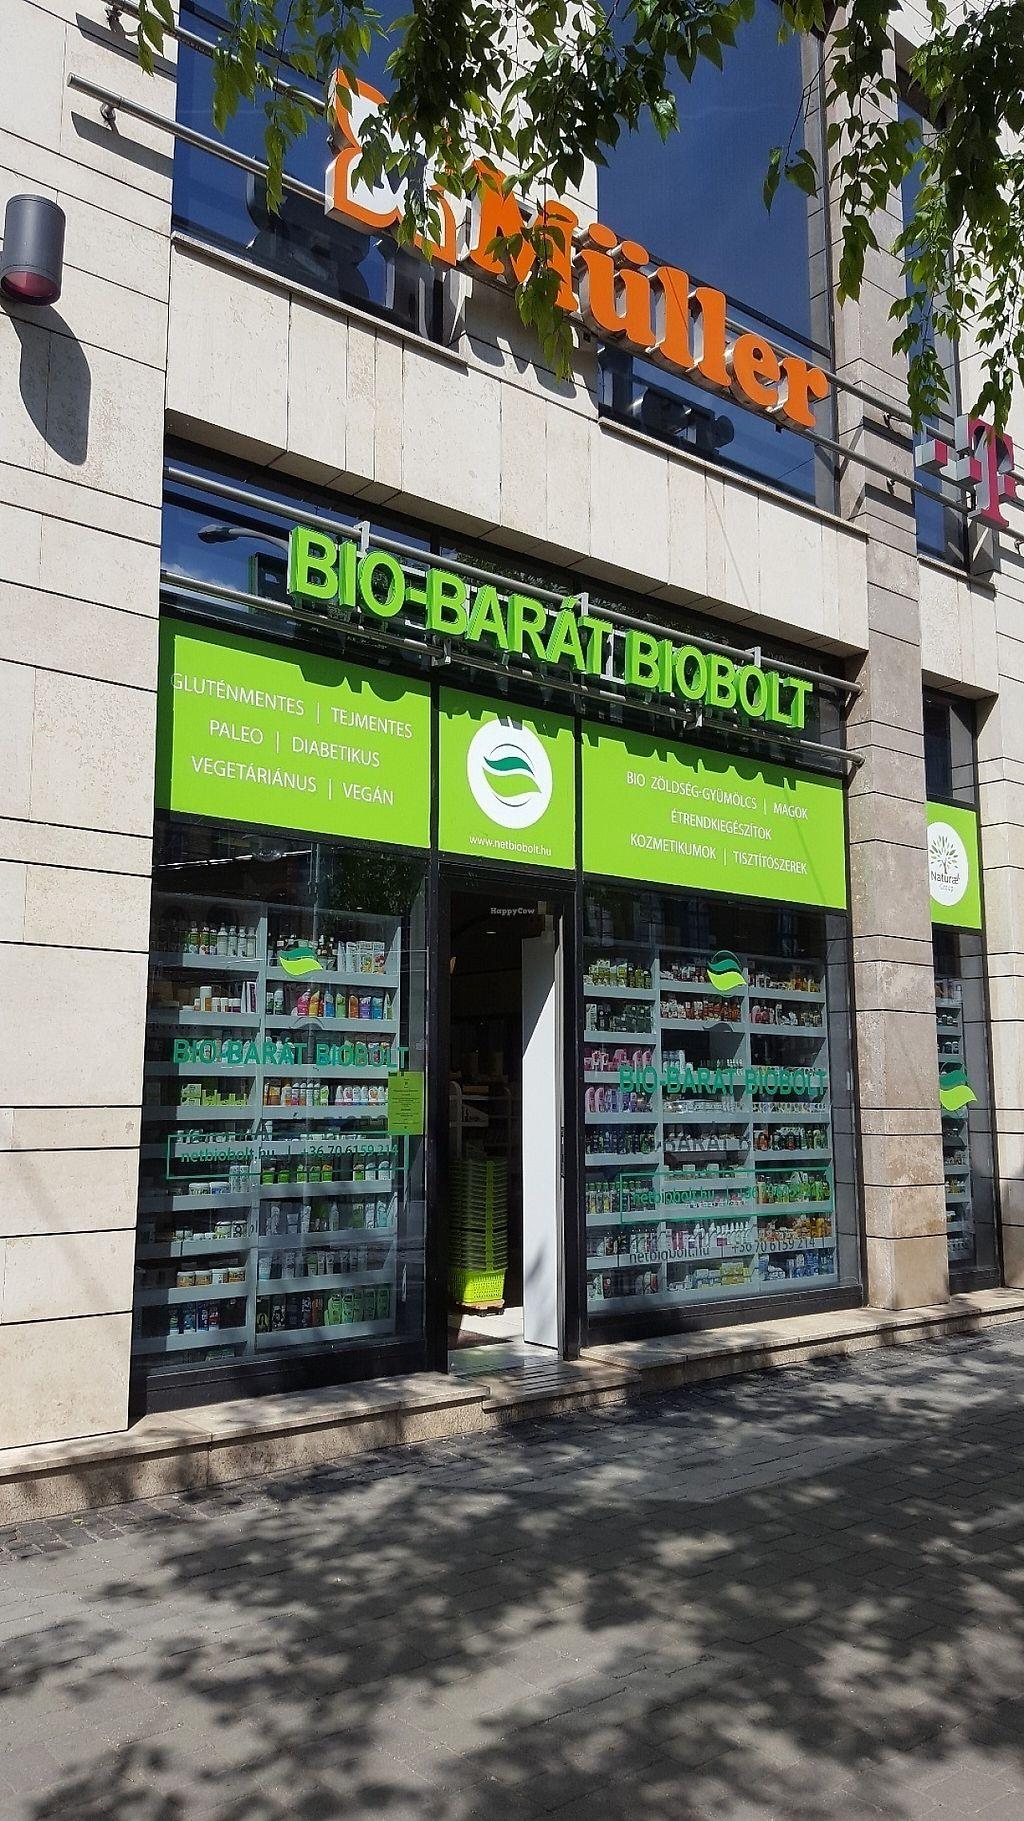 "Photo of Biobolt  by <a href=""/members/profile/Marketa"">Marketa</a> <br/>BIO Barát Biobolt <br/> May 17, 2017  - <a href='/contact/abuse/image/92198/259433'>Report</a>"